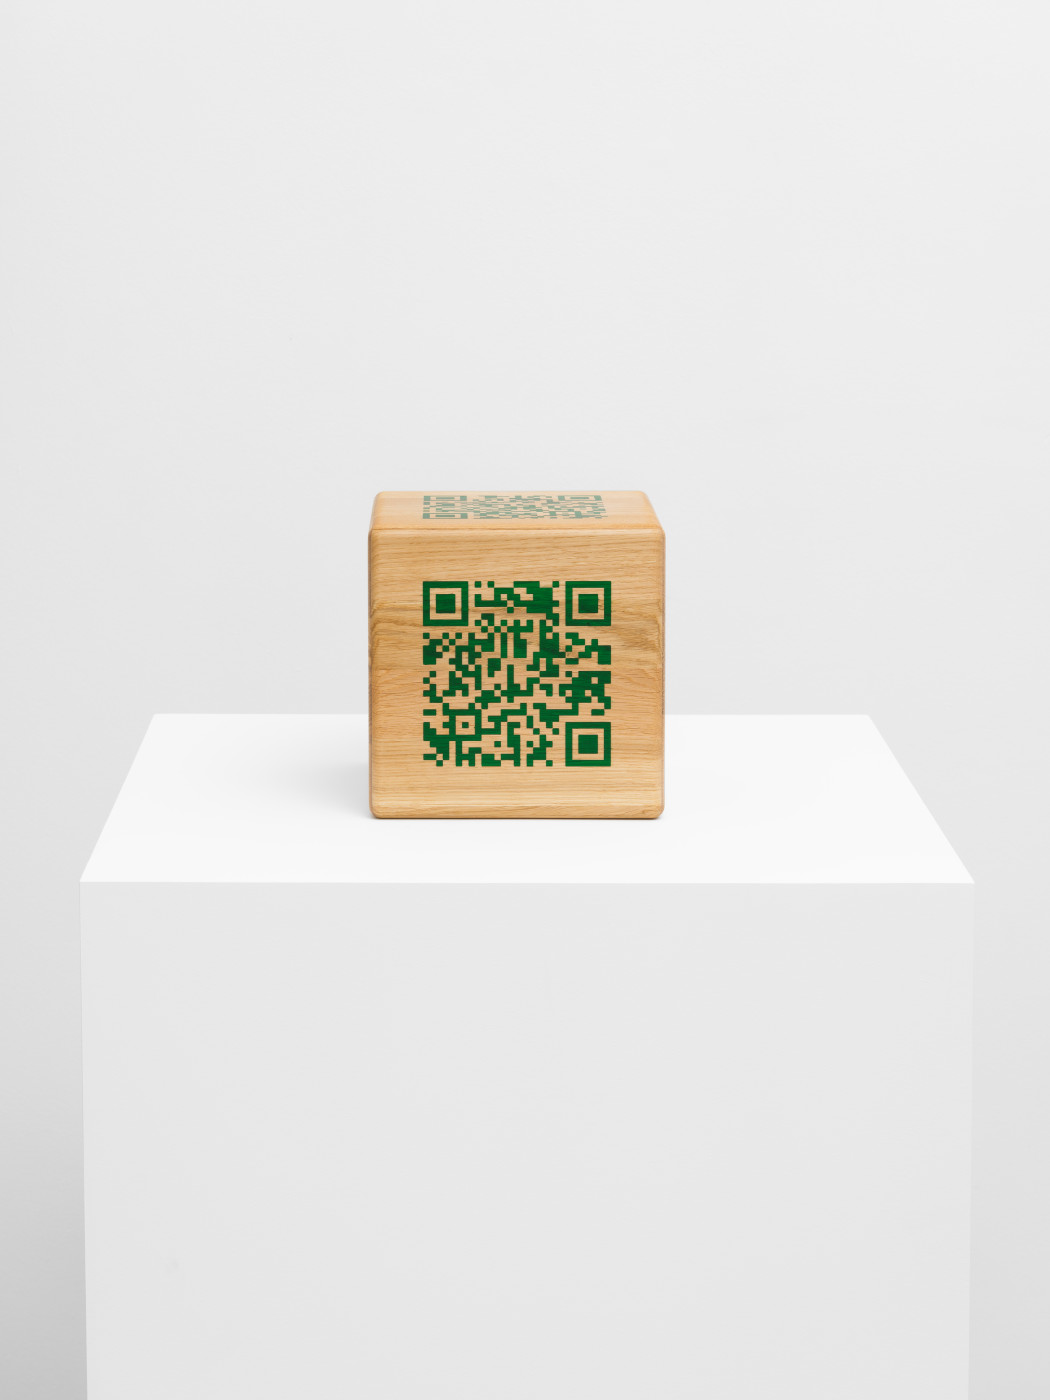 "<div class=""artwork_caption""><div class=""title""><em>6 Sides of Scott Mendes</em></div><div class=""medium"">oak panels, epoxy adhesive, trans emerald epoxy filler</div><div class=""dimensions"">Cube size : 21.5 x 21.5 x 21.5 cm<br />QR–Code size : 13.5 x 13.5 cm (each side has an individual code in the same size)</div></div><div class=""link""><span class=""website_contact_form"" data-contact-form-details=""6 Sides of Scott Mendes  oak panels, epoxy adhesive, trans emerald epoxy filler  Cube size : 21.5 x 21.5 x 21.5 cm QR–Code size : 13.5 x 13.5 cm (each side has an individual code in the same size)"" data-contact-form-image=""https://artlogic-res.cloudinary.com/w_200,h_200,c_fill,f_auto,fl_lossy/ws-sadiecoles/usr/exhibitions/images/exhibitions/865/hq24-db17550_qr-code_8.jpeg"">Enquire</span></div>"